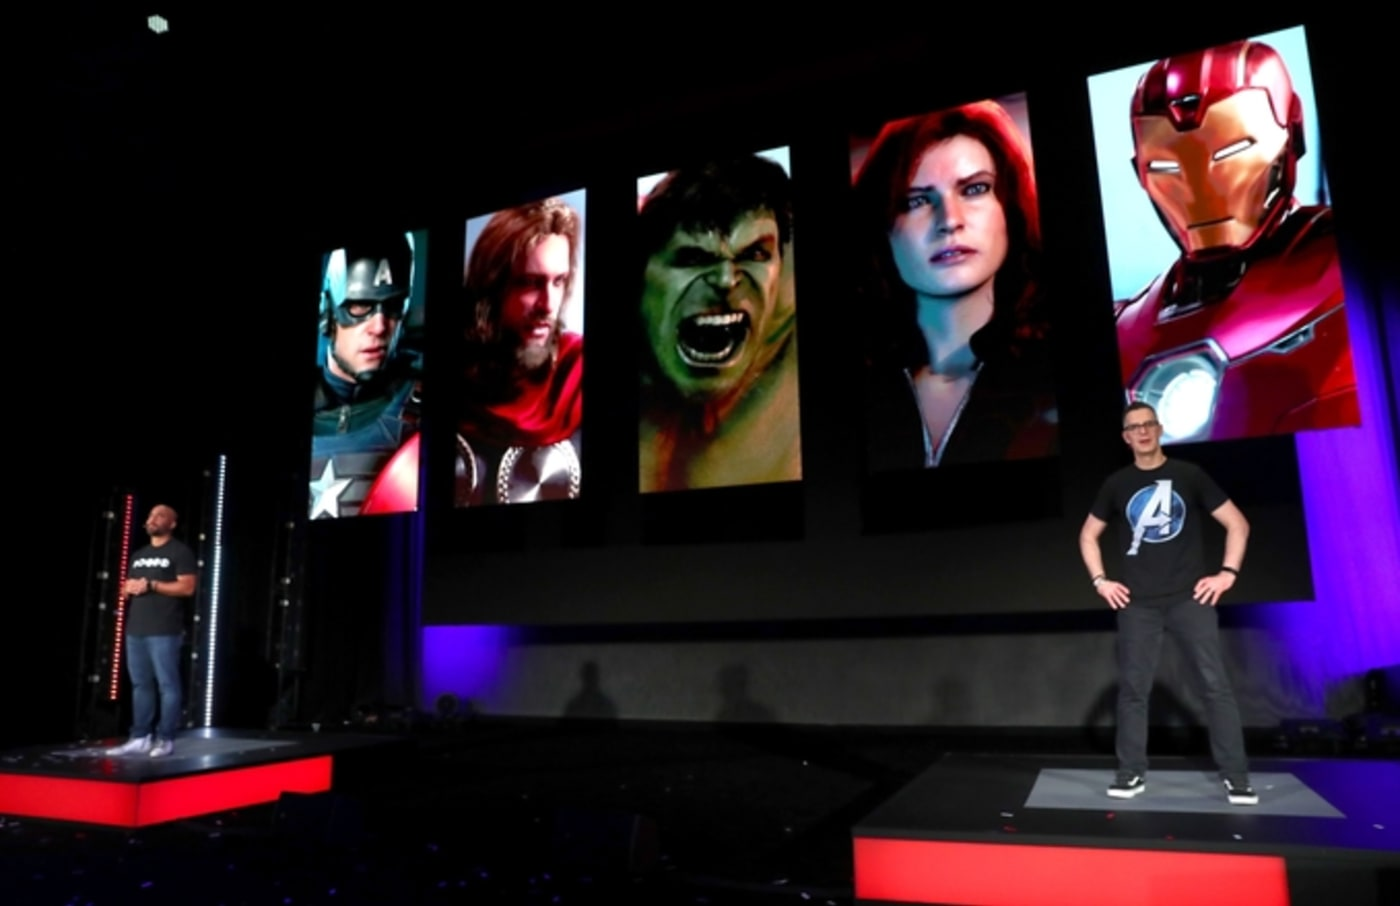 avengers square enix mvideo game